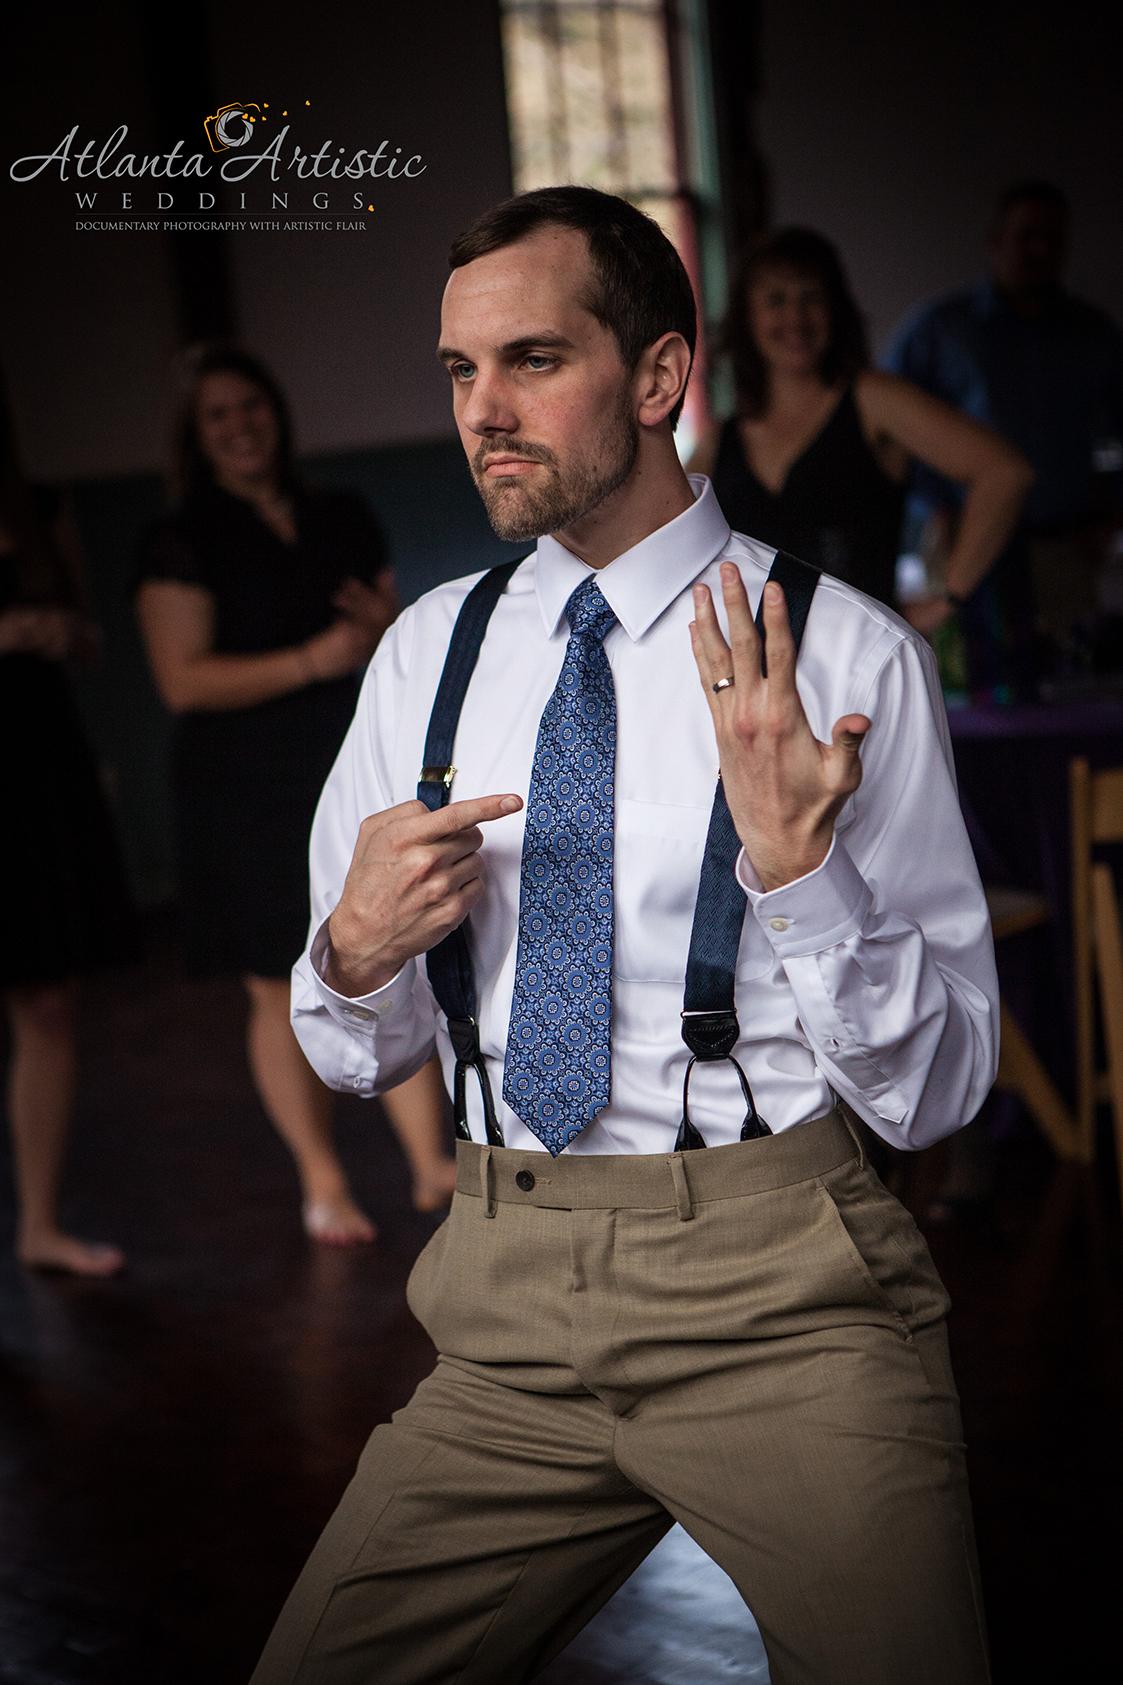 Atlanta Wedding Photography by www.AtlantaArtisticWeddings.com